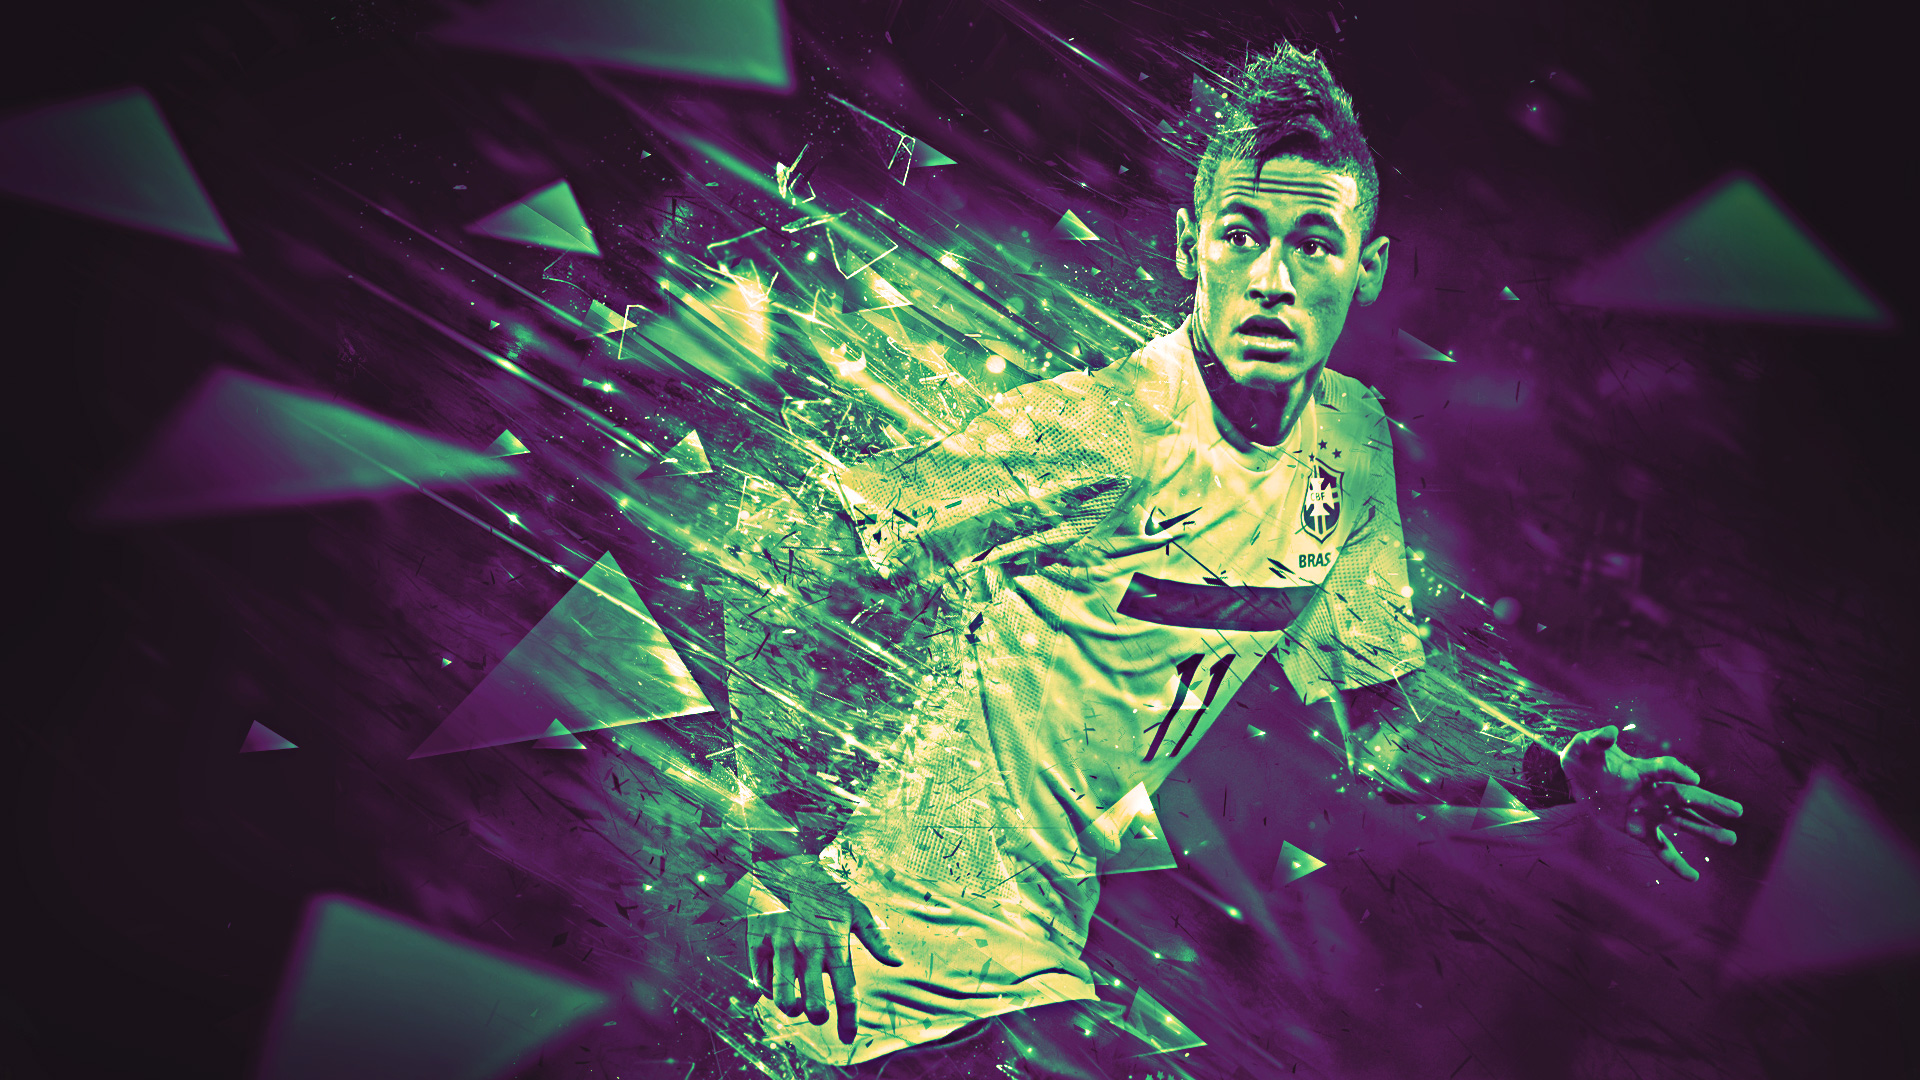 Neymar Wallpaper Hd 2014 wallpaper   1225479 1920x1080